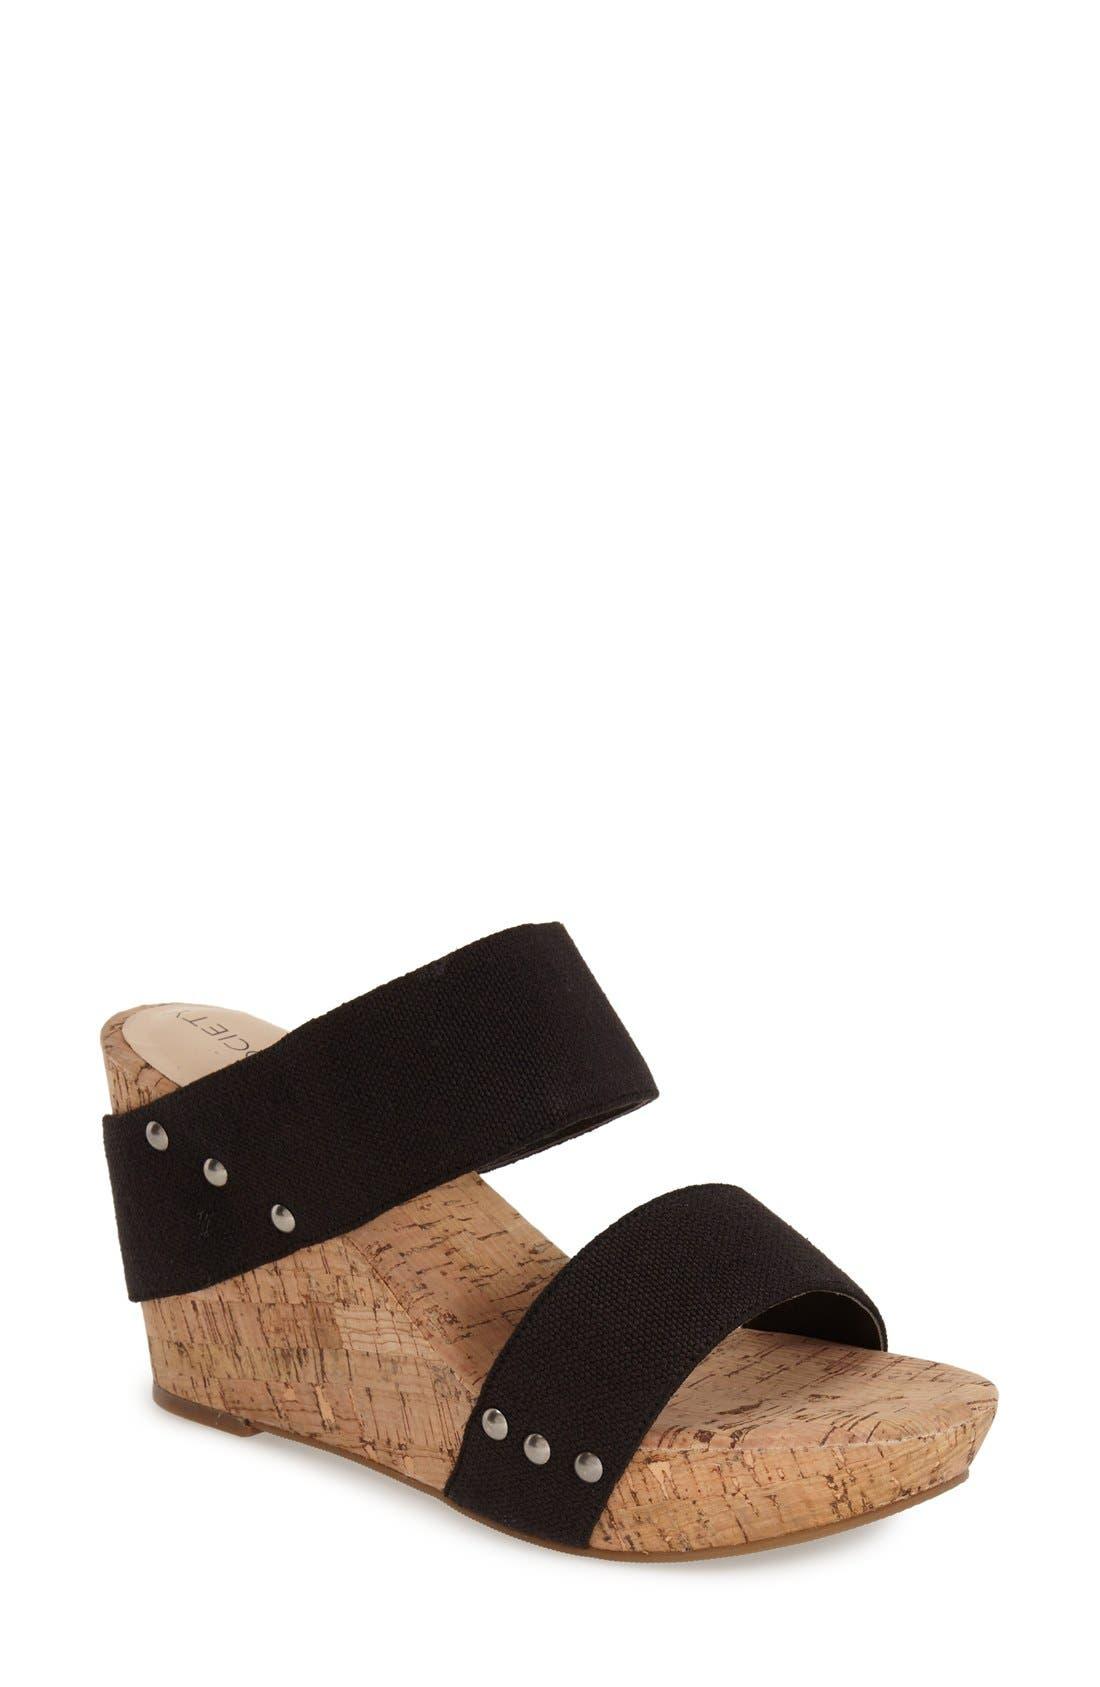 'Emilia 2' Wedge Sandal,                             Main thumbnail 1, color,                             Black